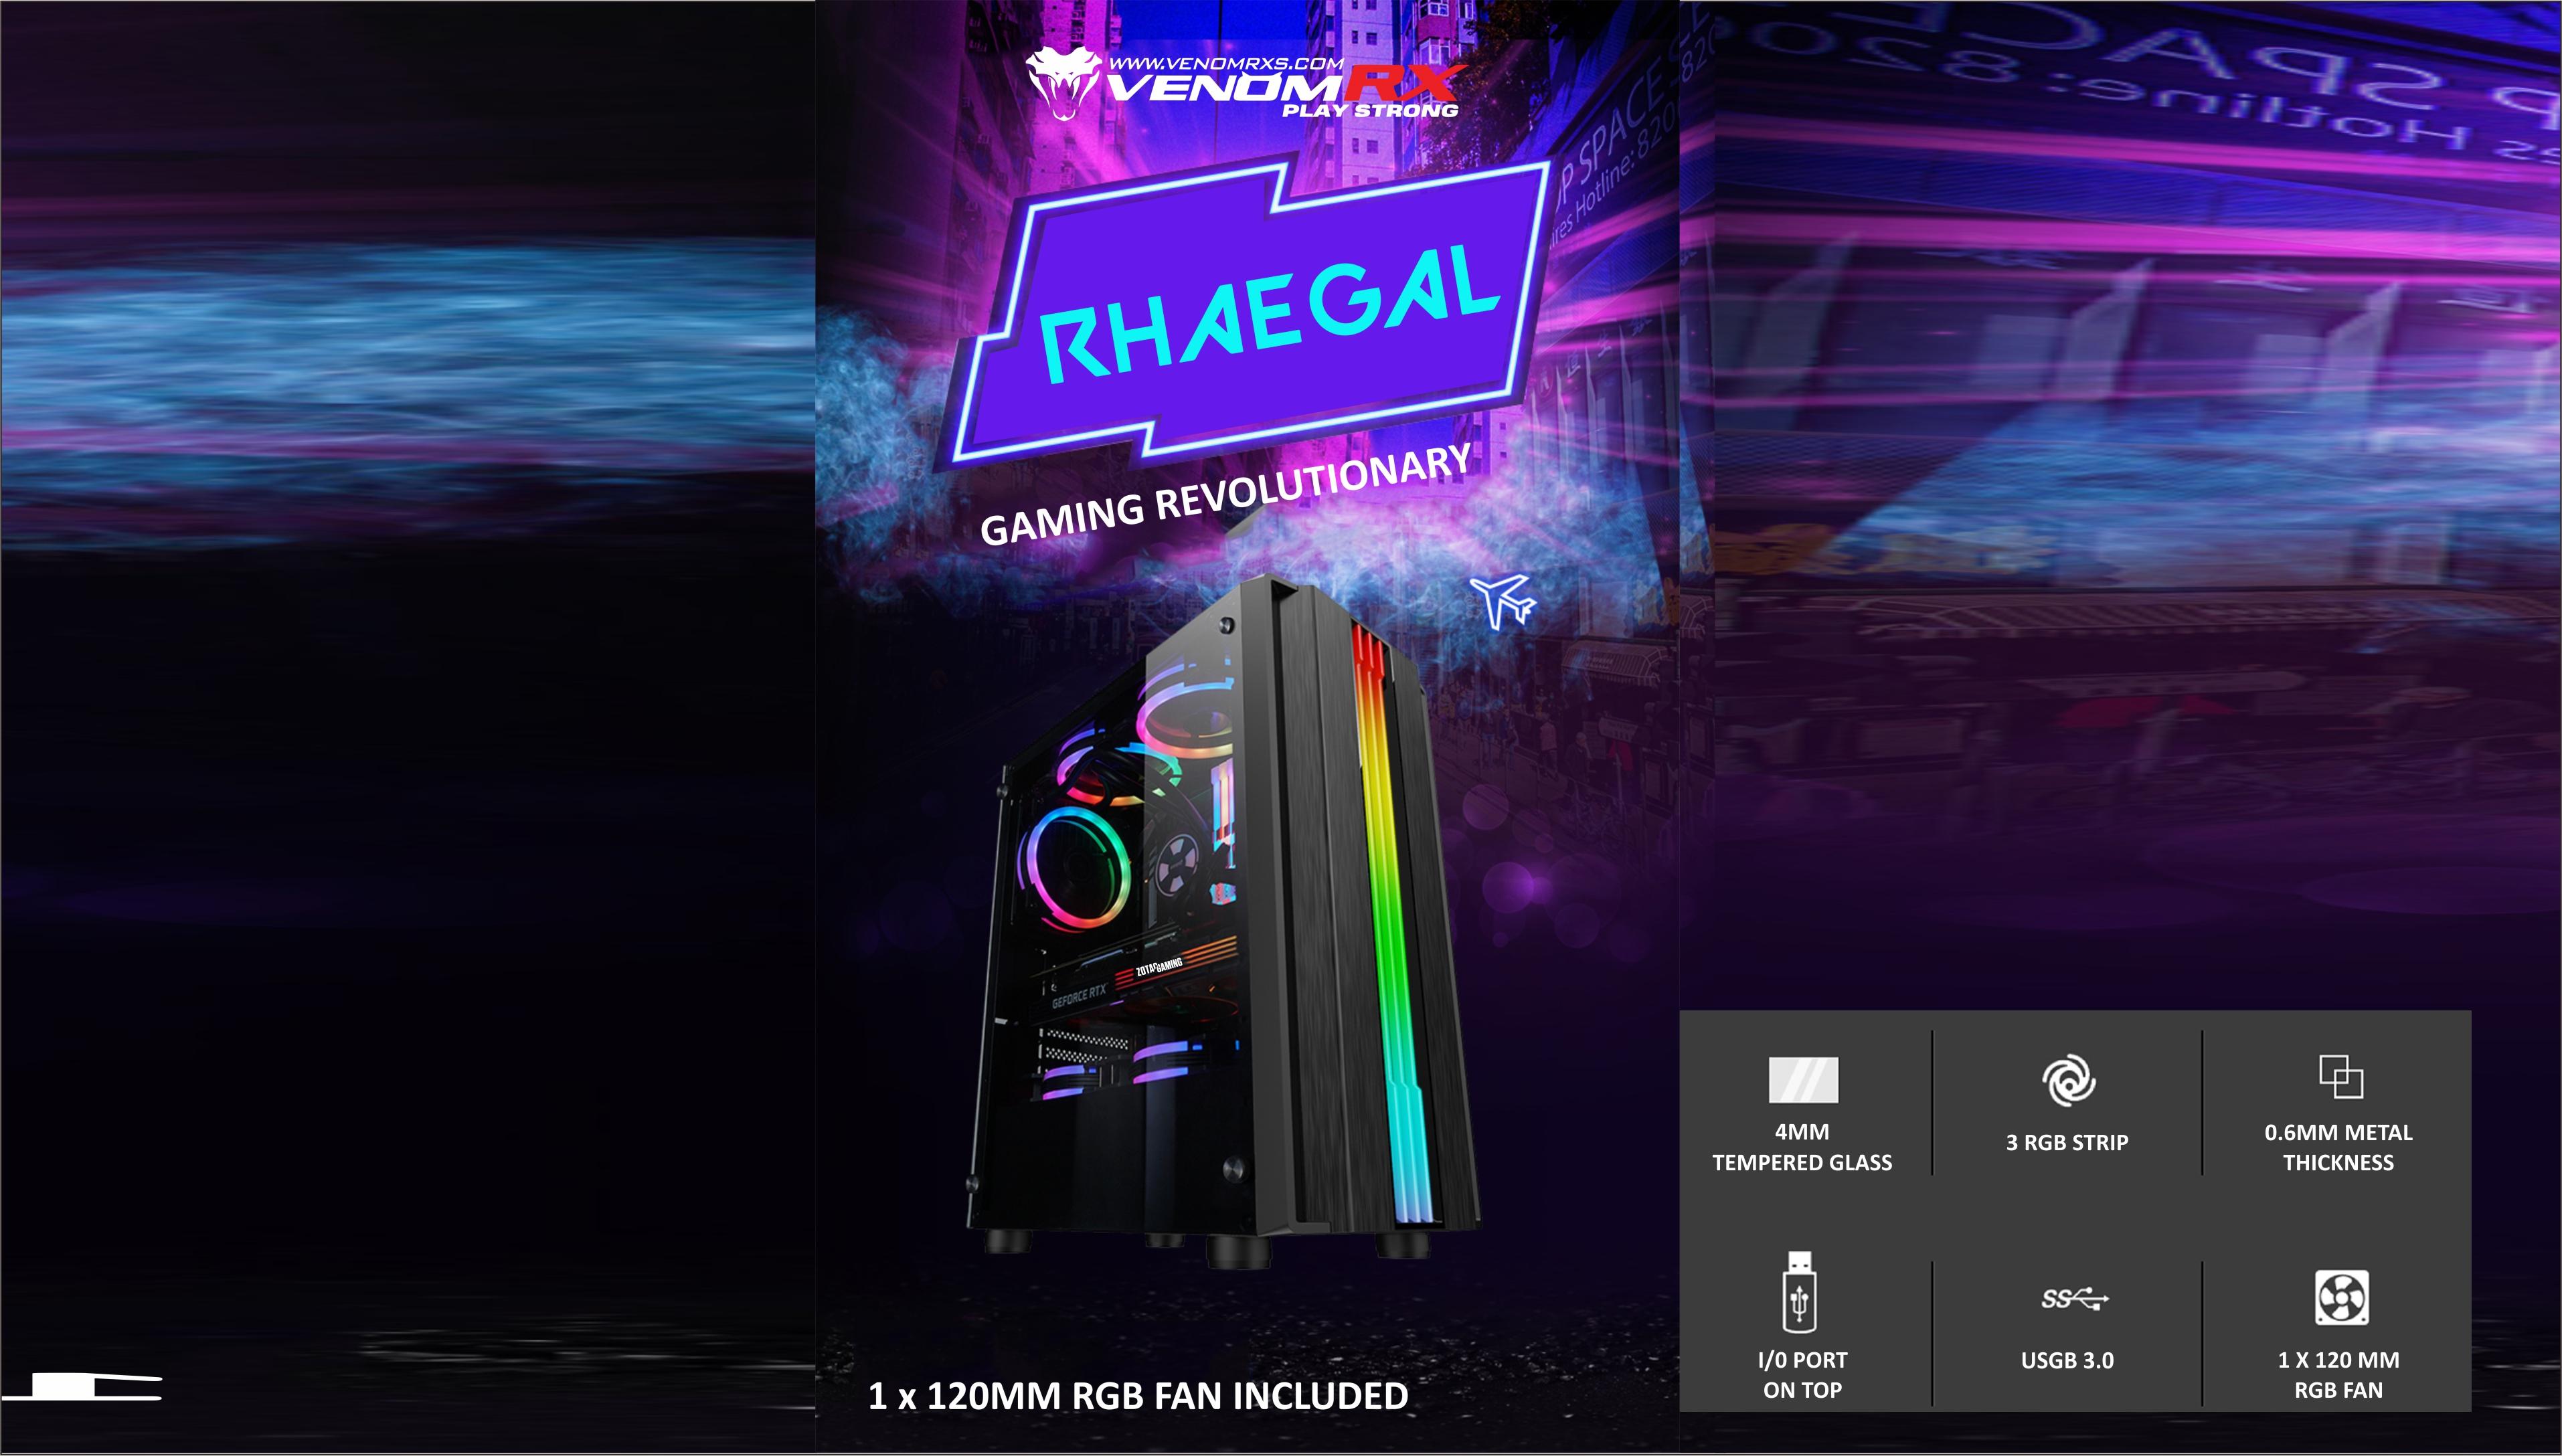 Rhaegal_1